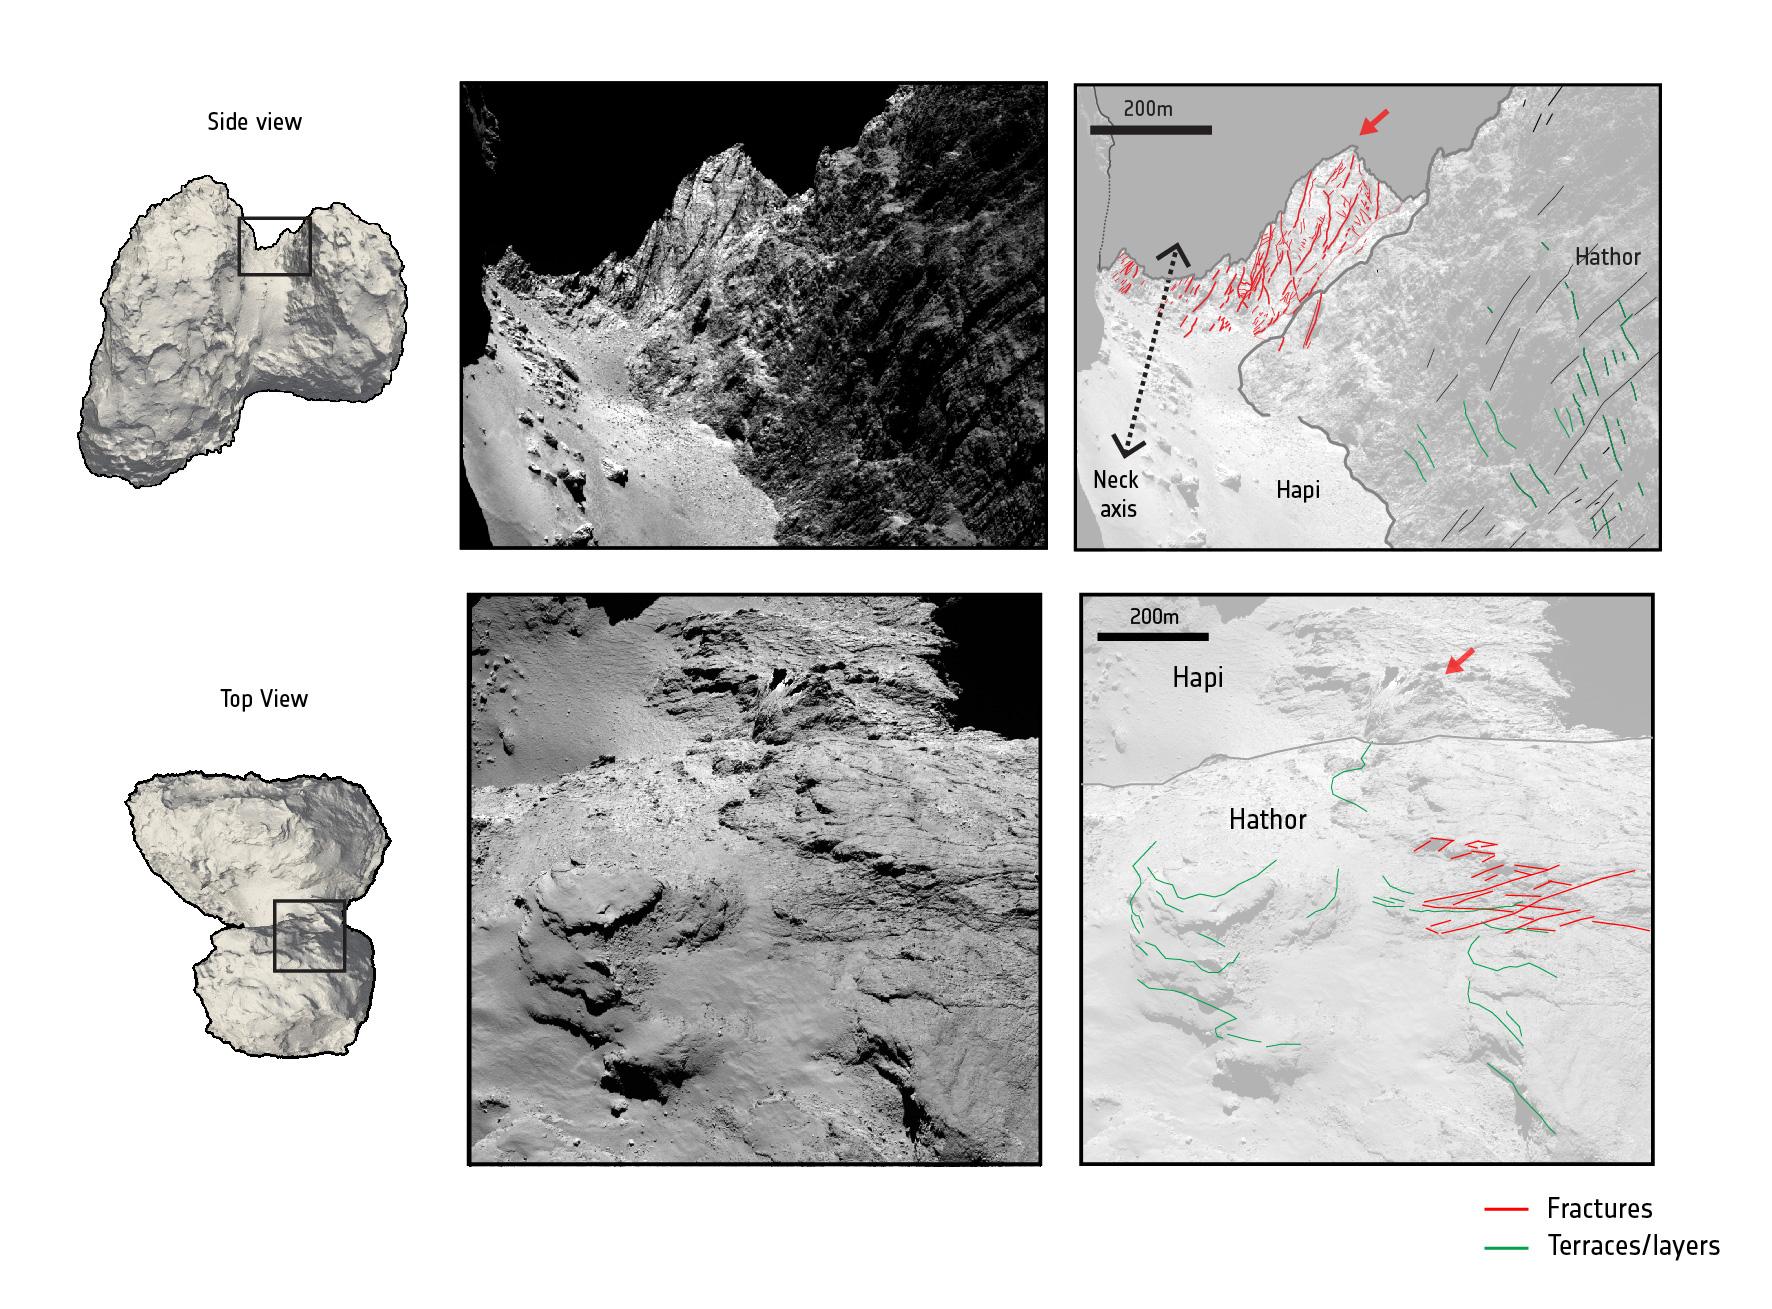 1567213757416-Rosetta_OSIRIS_67P_Stress-formed_fractures_and_terraces.jpg